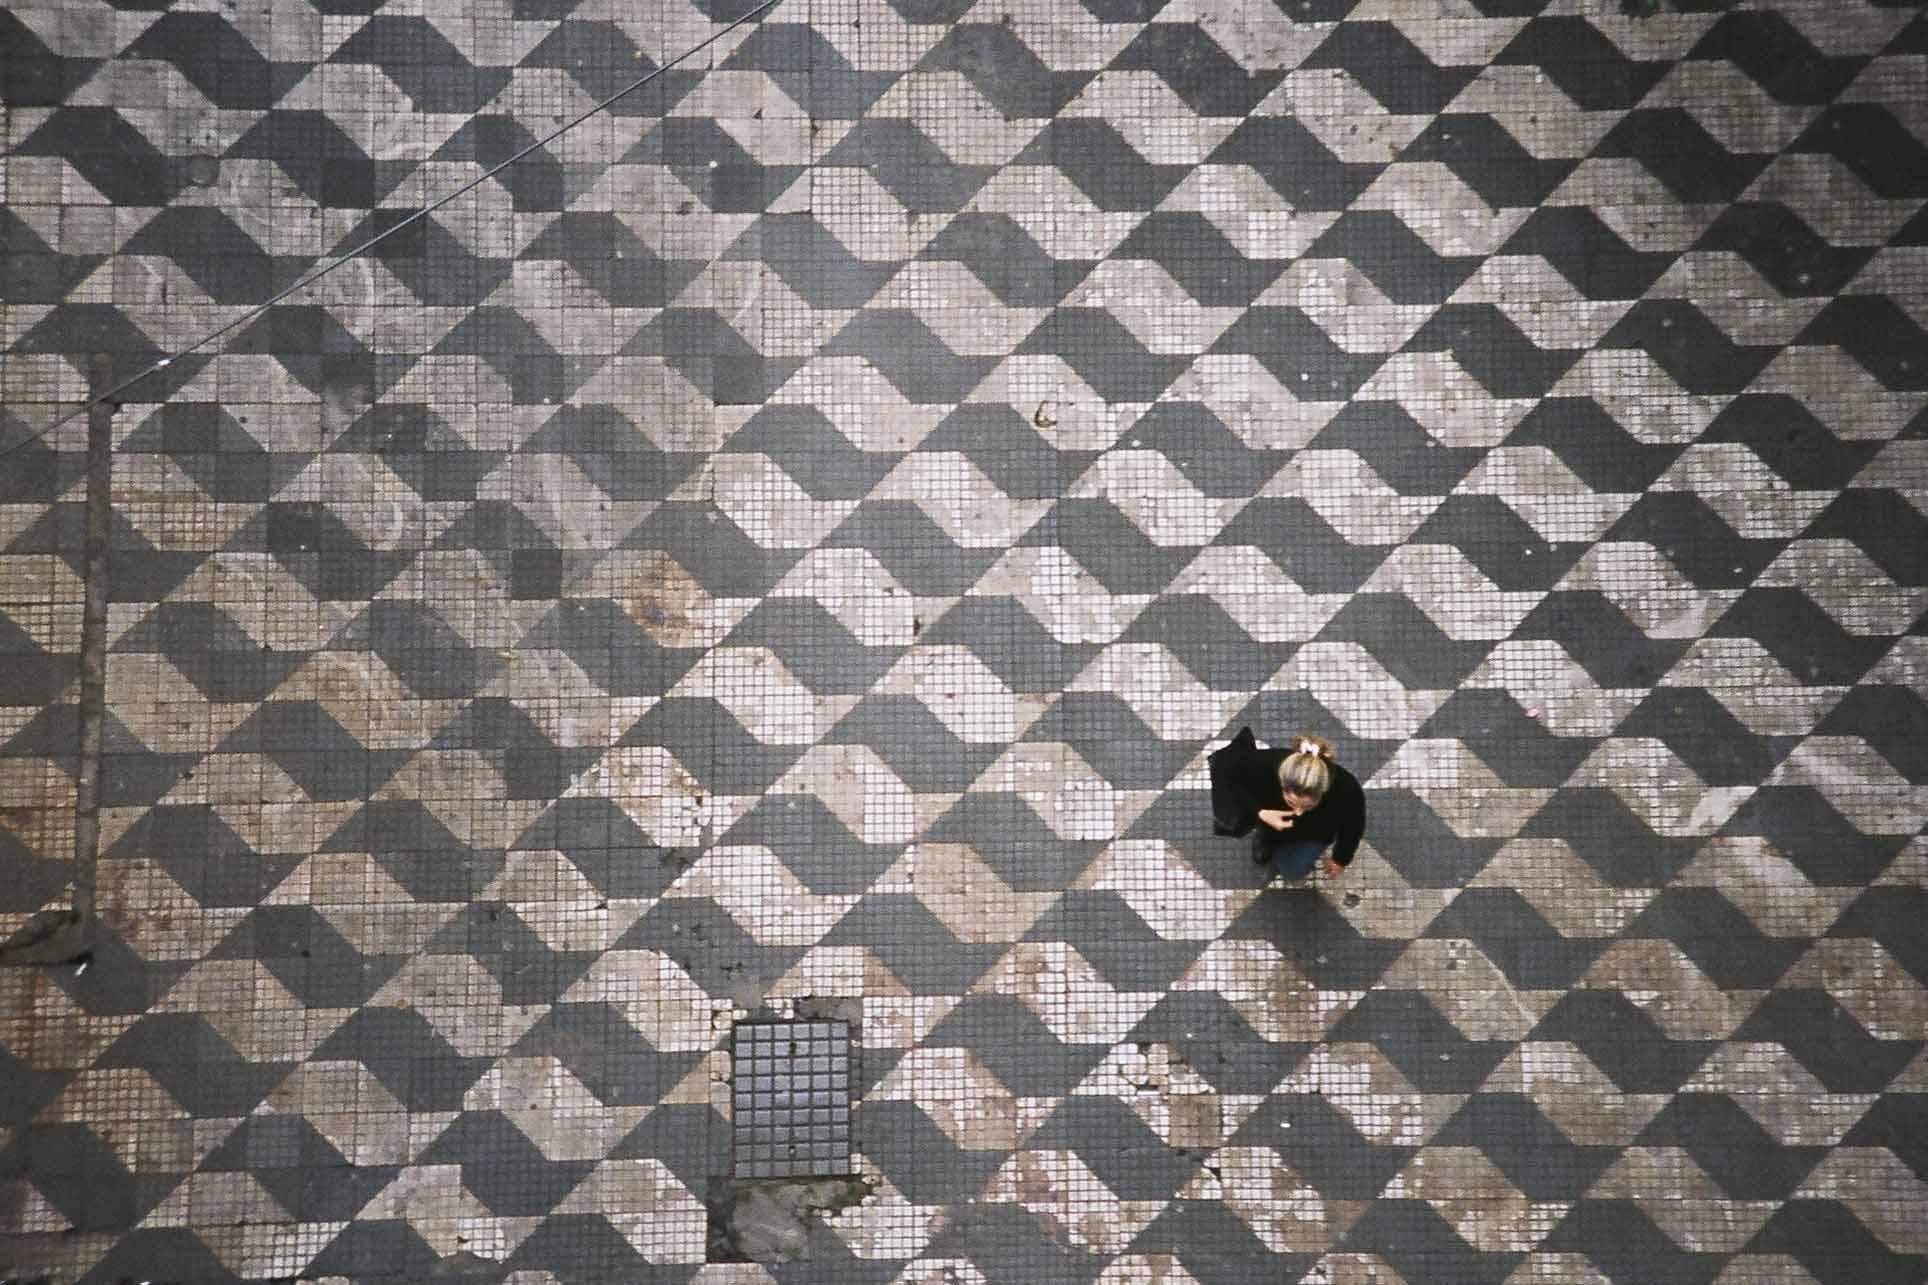 Calçada de São Paulo. Foto:  asleeponasunbeam @ Flickr